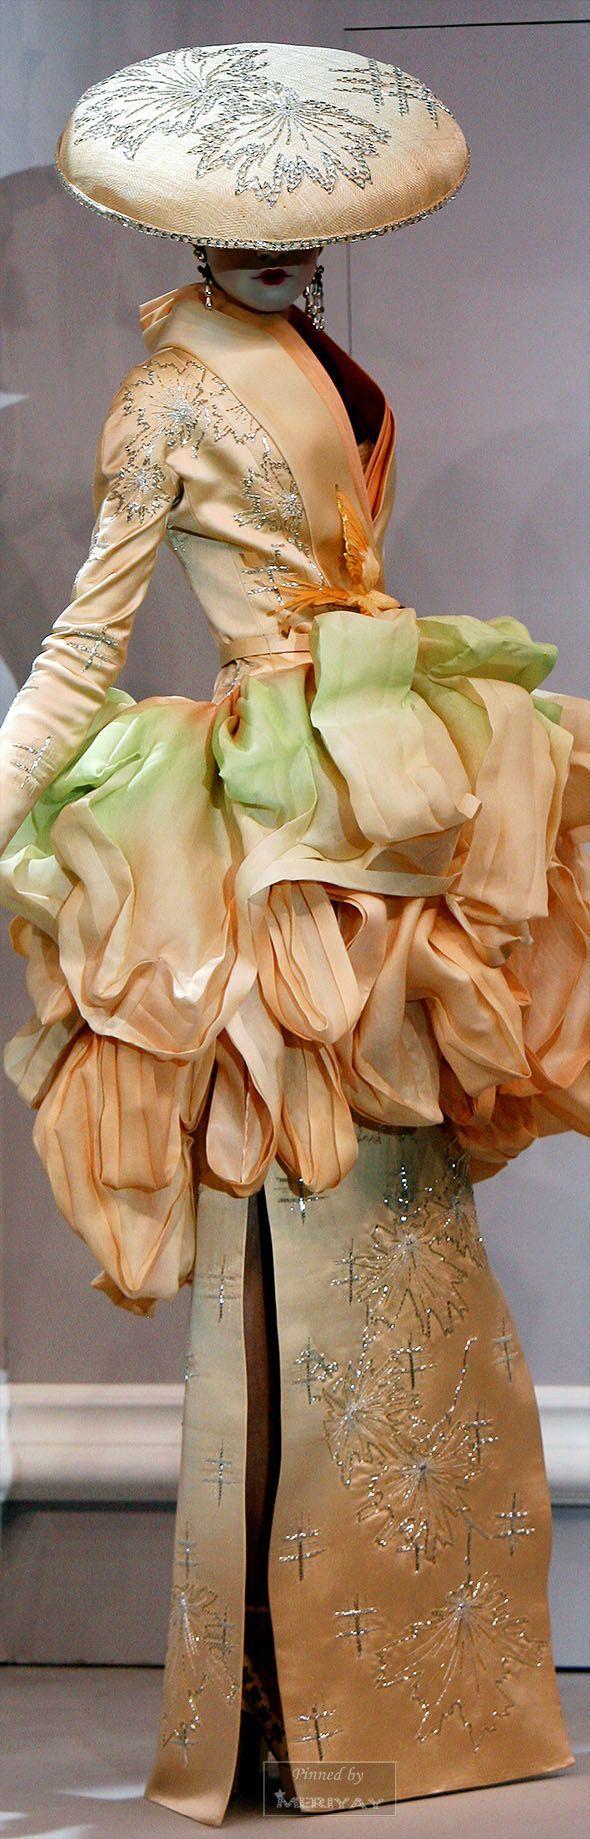 John Galliano For Christian Dior Spring/Summer 2007 jαɢlαdy